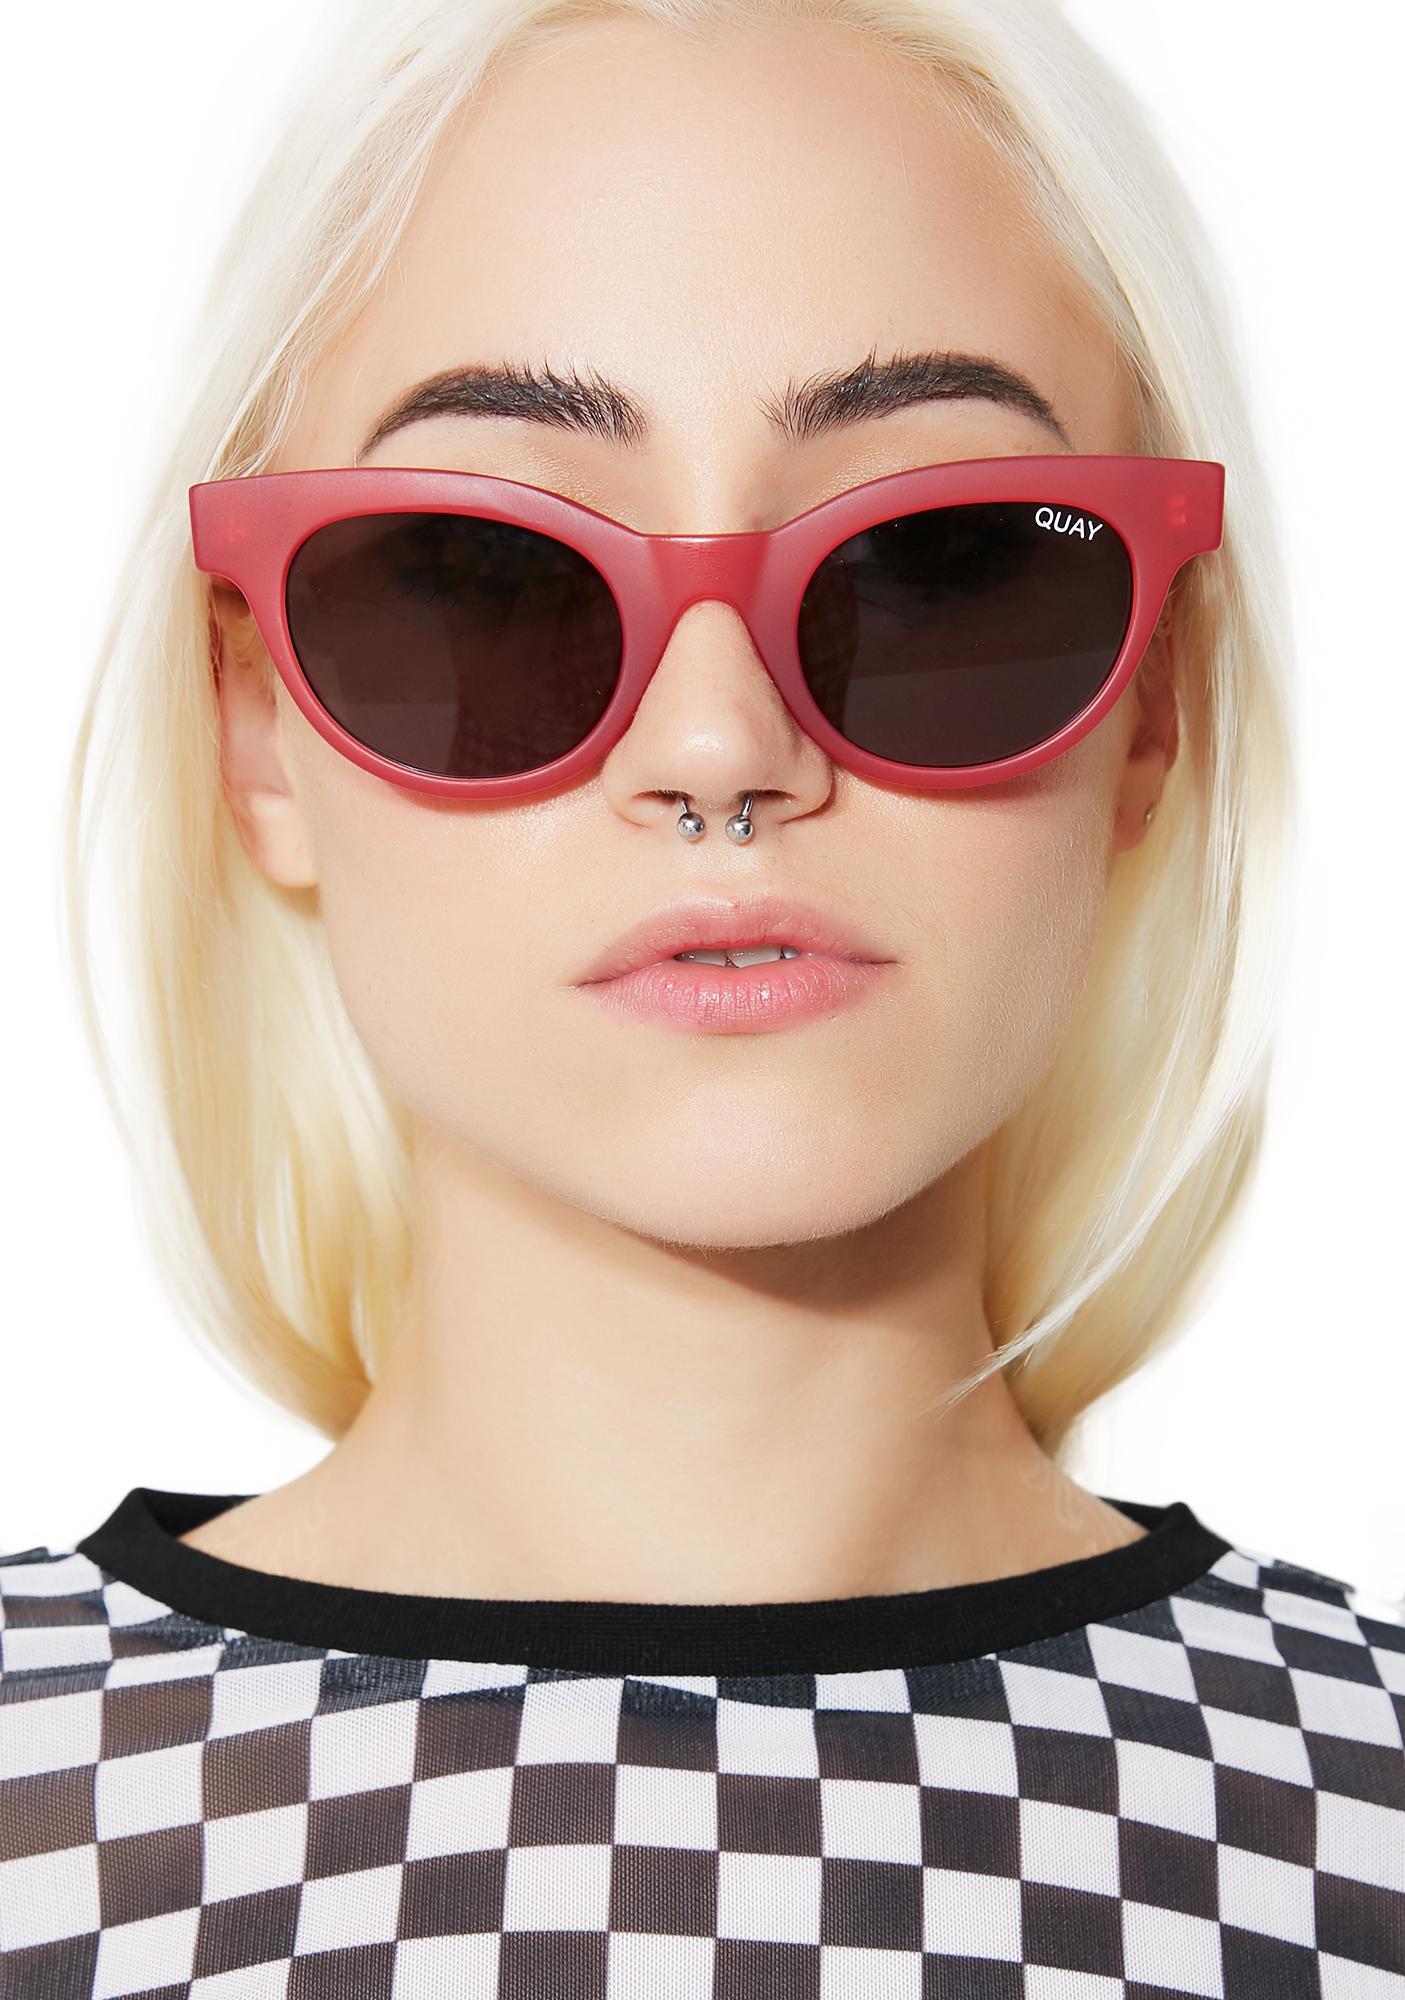 2b9ca8e494fc4 Quay Eyeware x Kylie Starstruck Sunnies